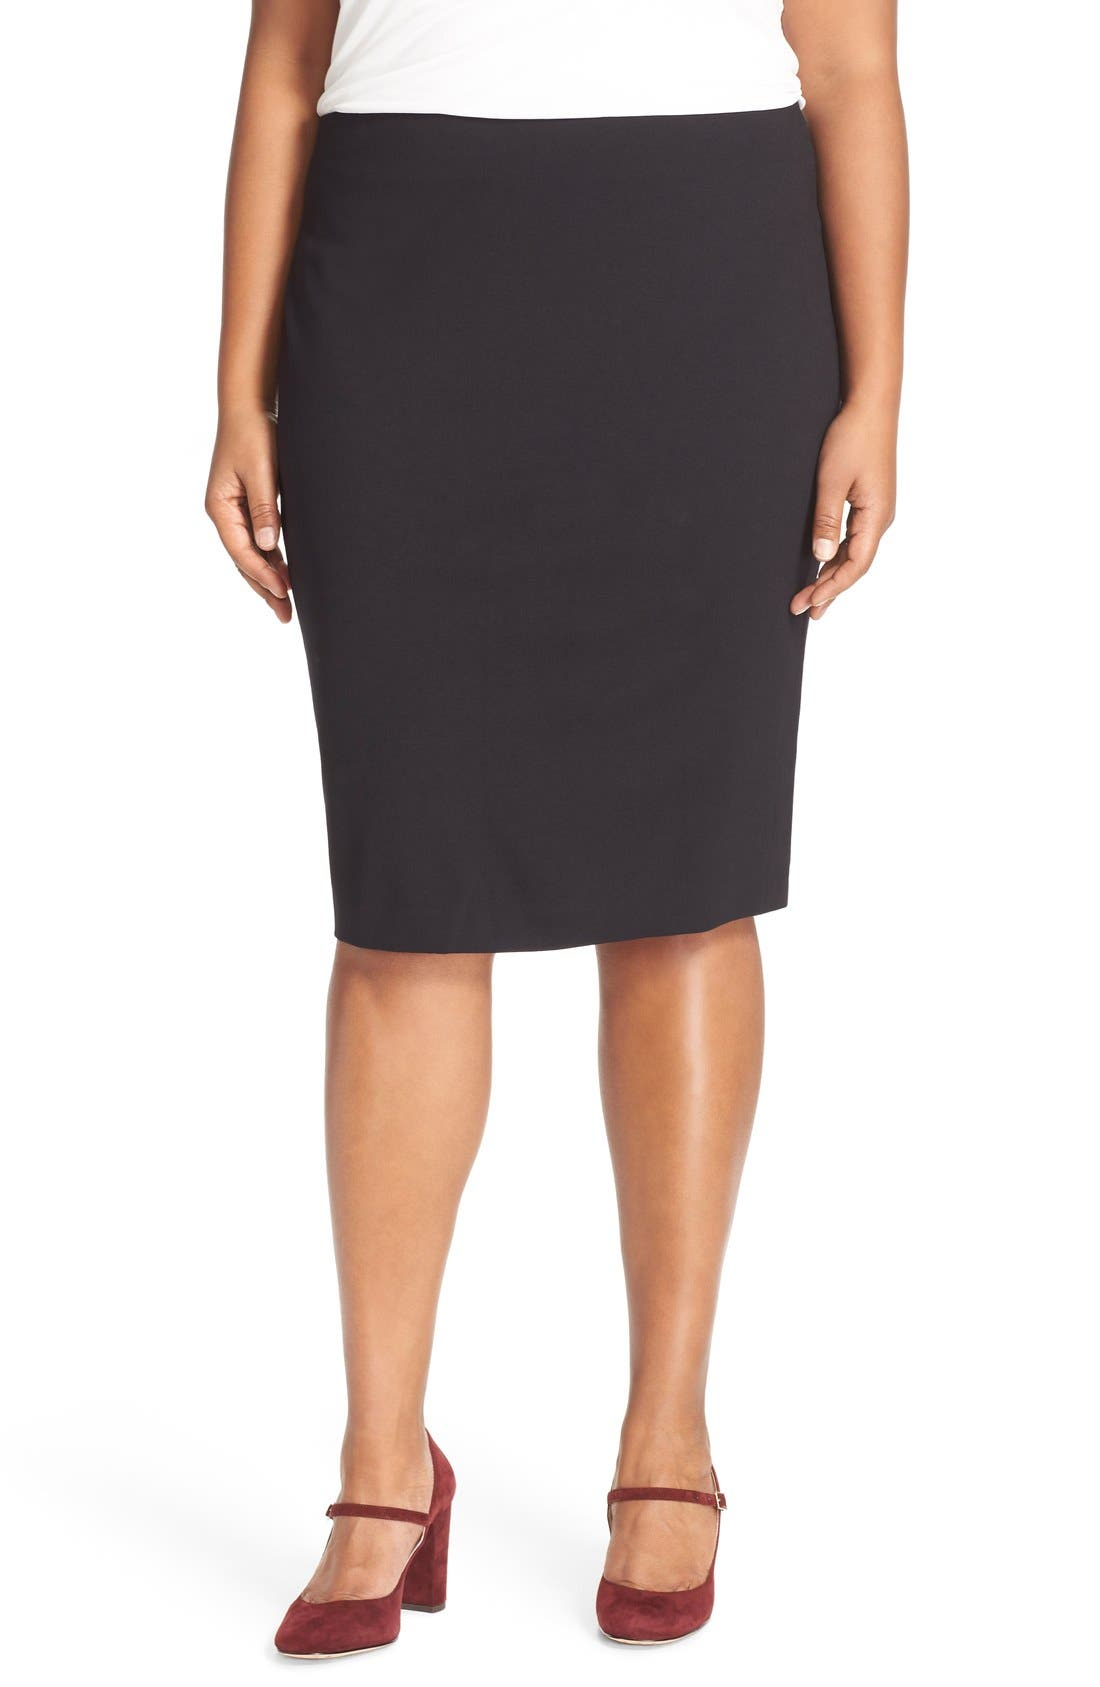 Plus Size Vince Camuto Ponte Knit Skirt